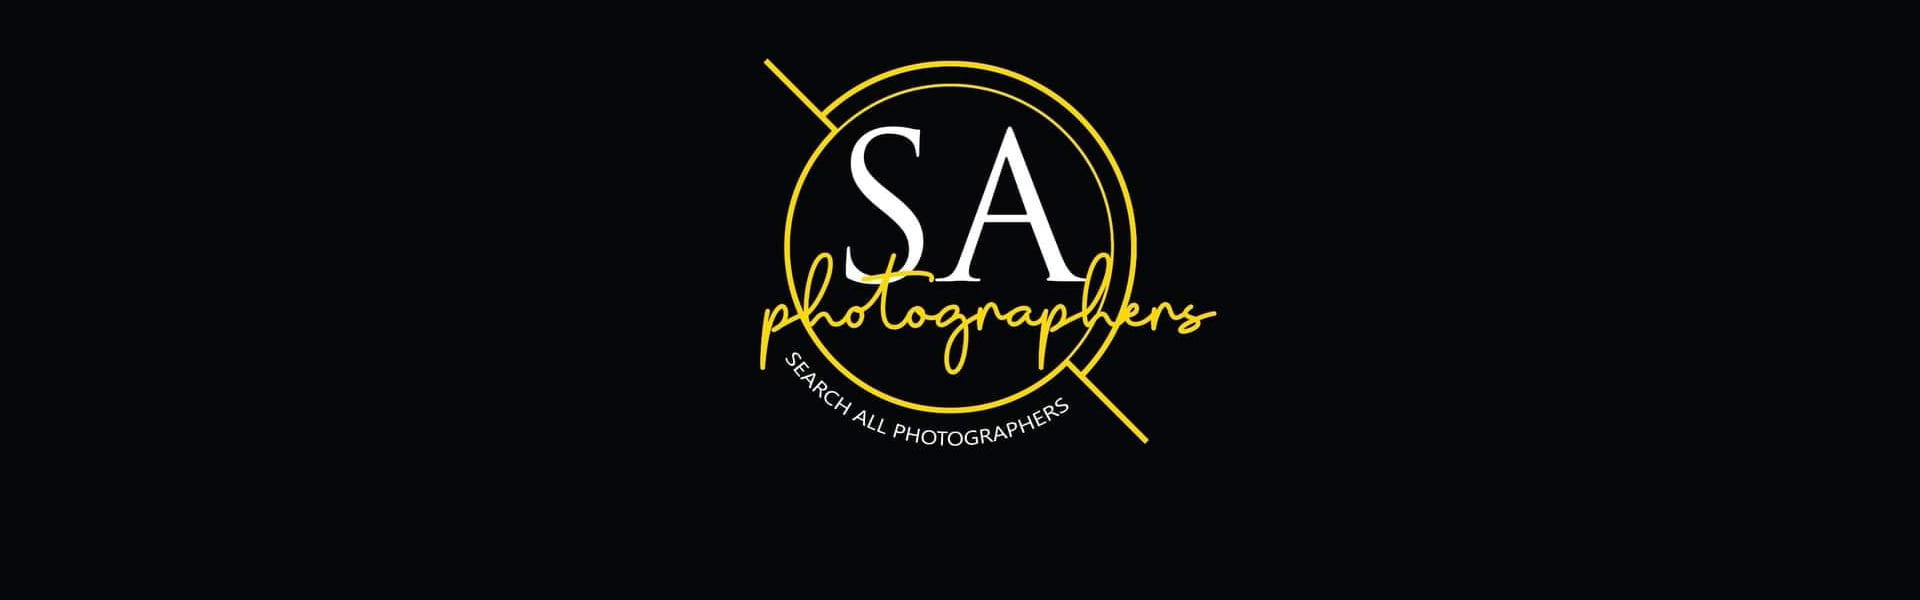 Pet Photography by SA Photographers